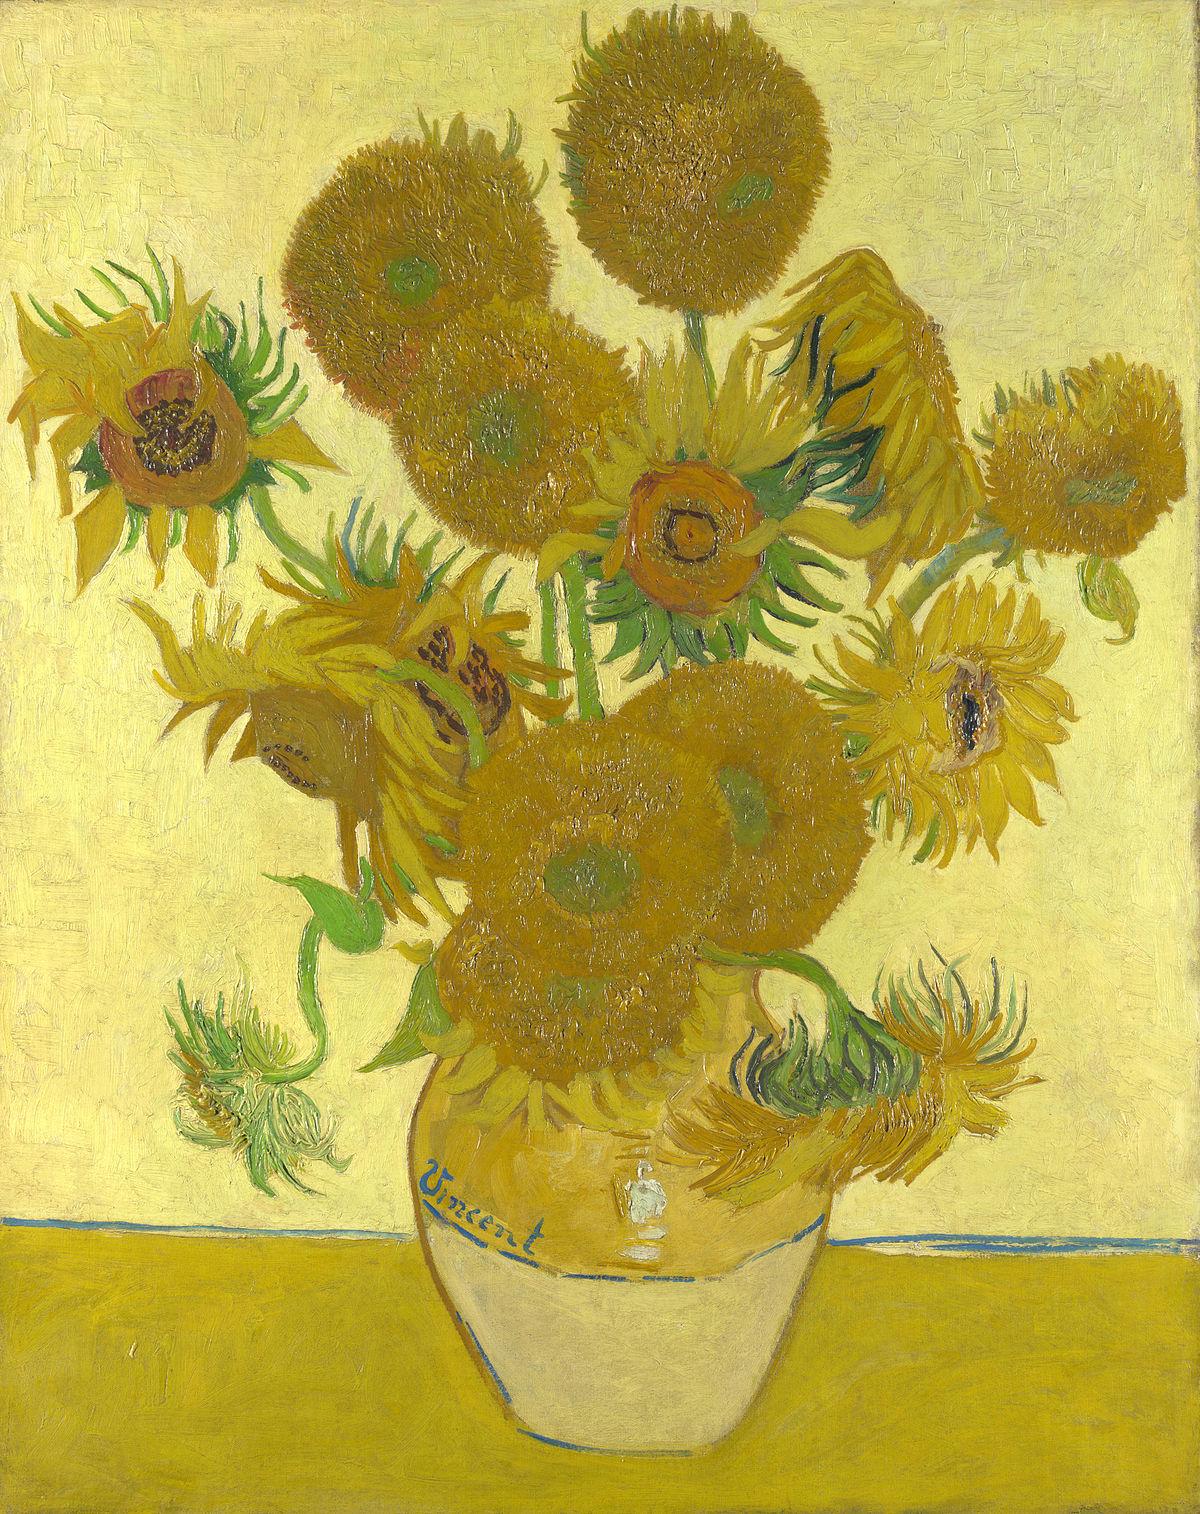 Les Tournesols De Van Gogh : tournesols, Sunflowers, Series), Wikipedia